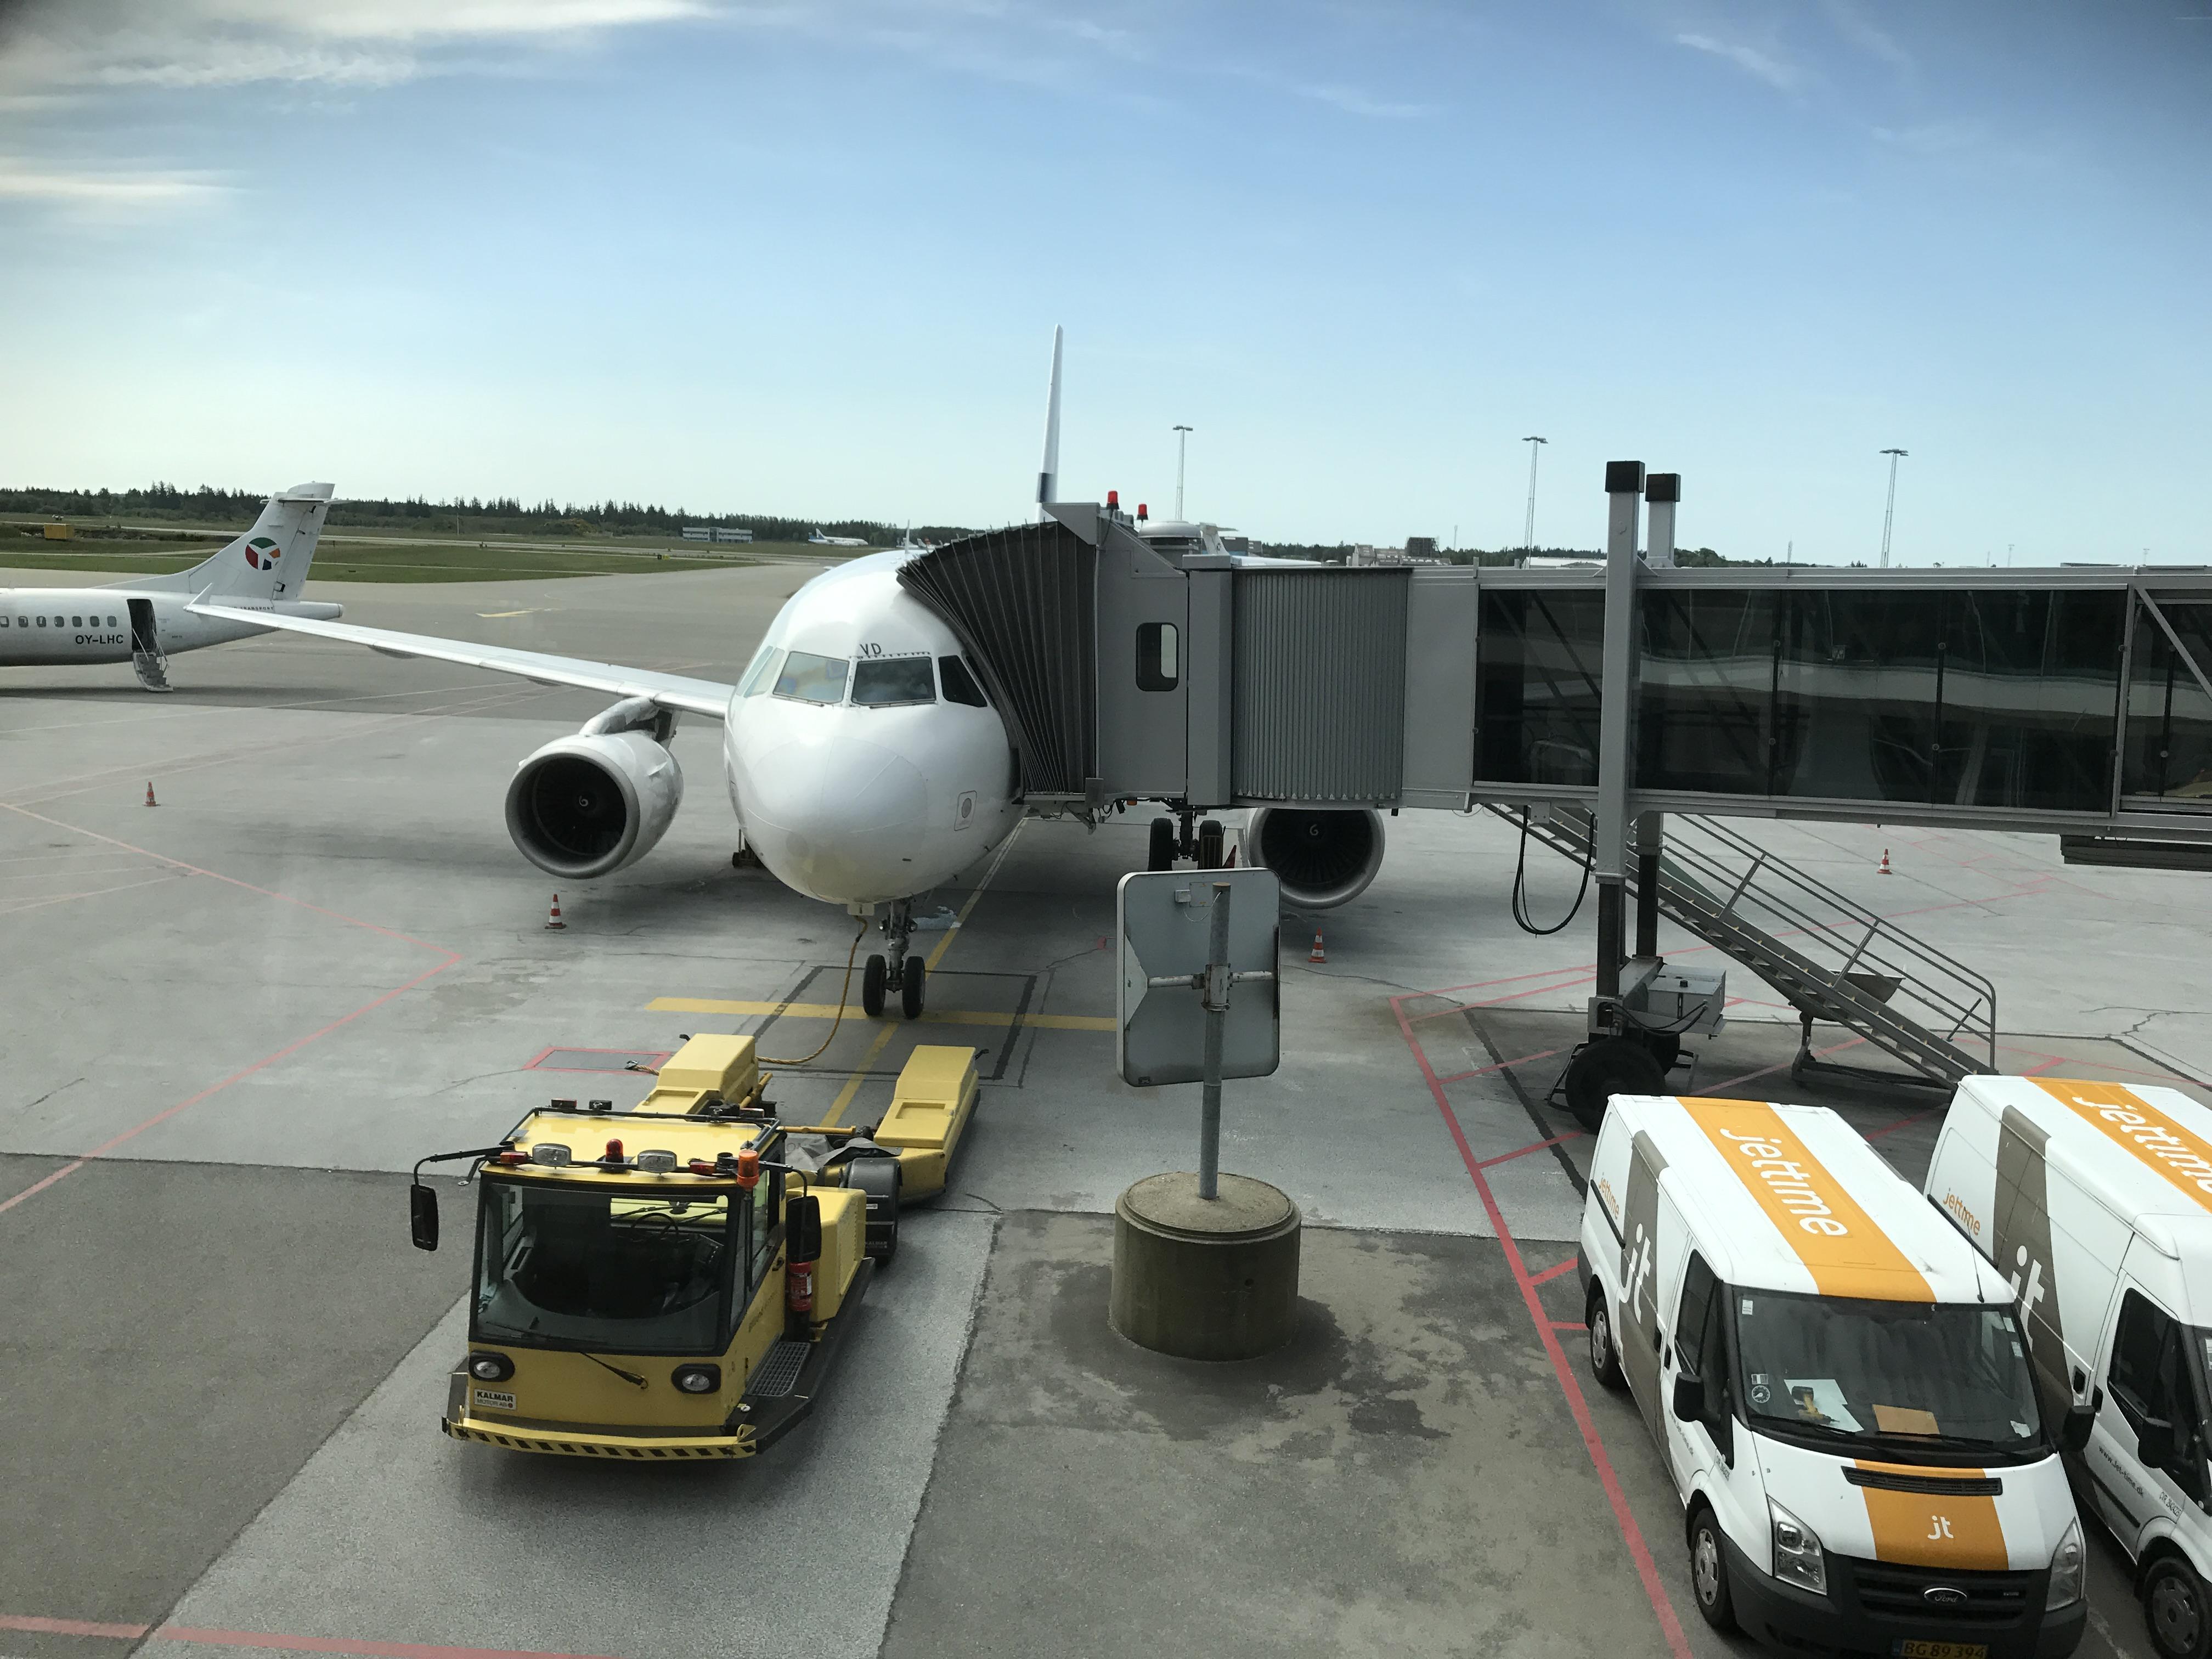 Finnairs A319 er klar ved gate 11 i Billund Lufthavn (Foto: Ole Kirchert Christensen)